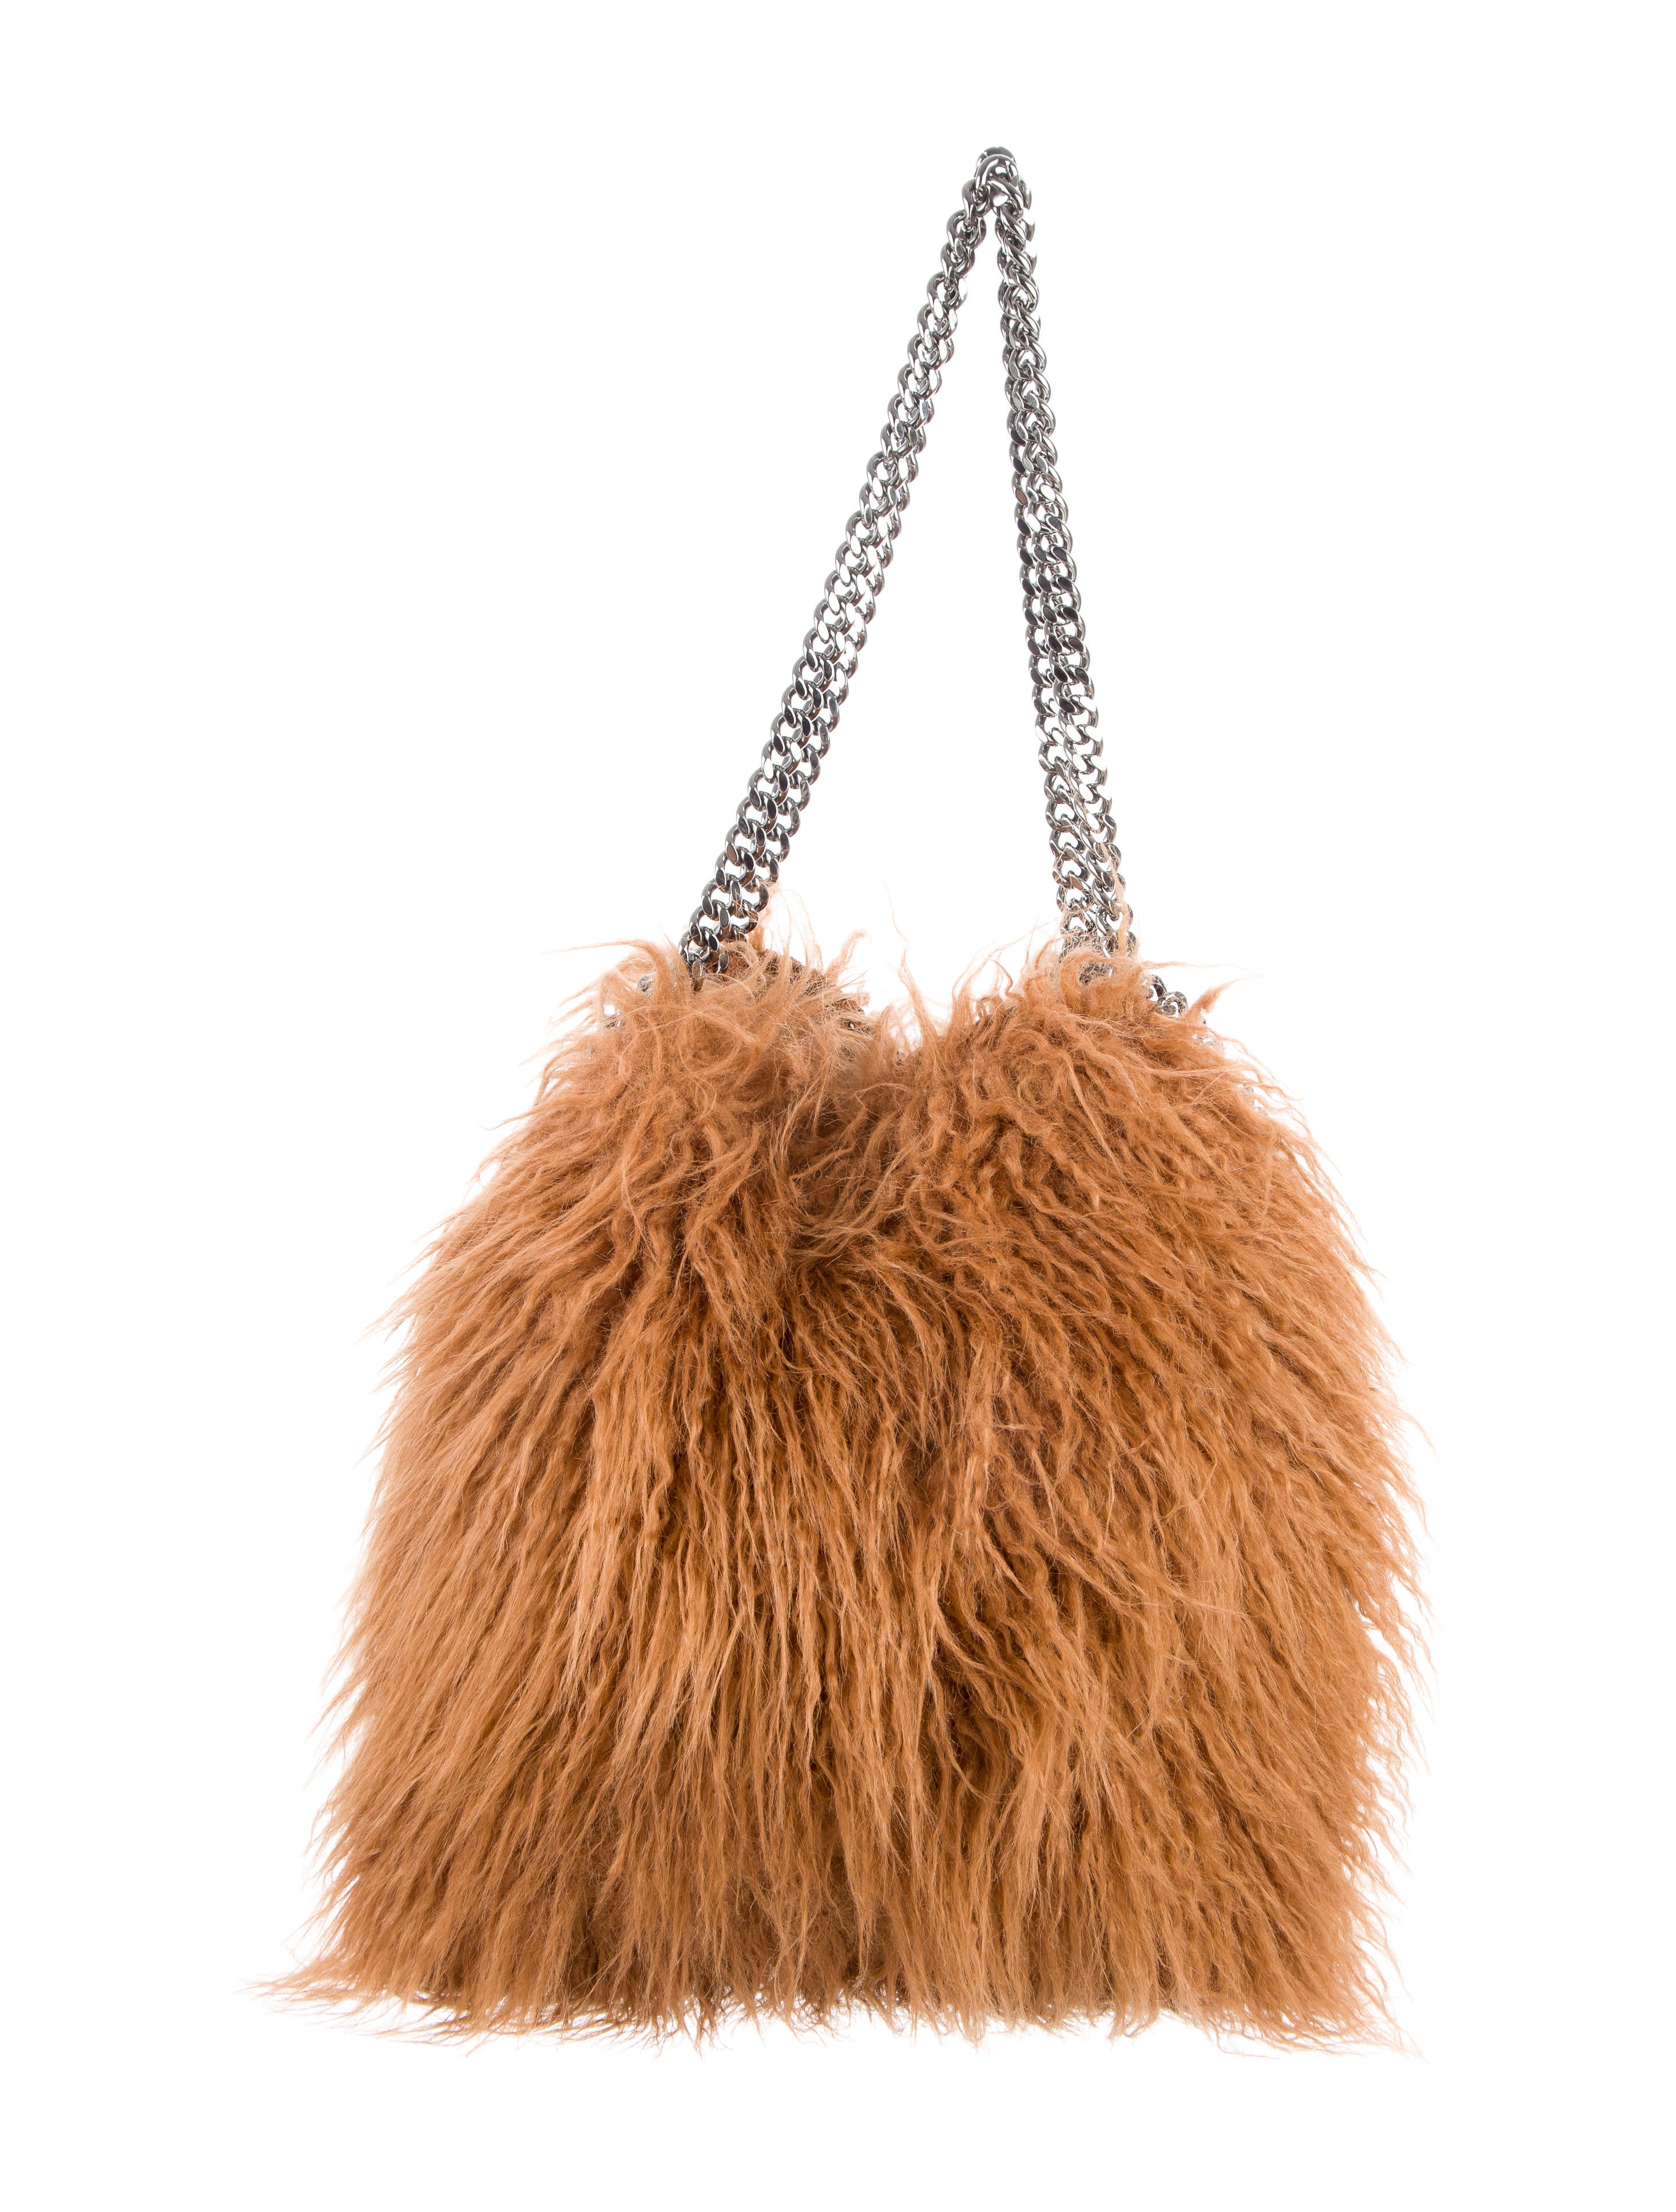 Stella McCartney Falabella Faux Fur Small Tote - Handbags - STL59884  7c83bce51953b